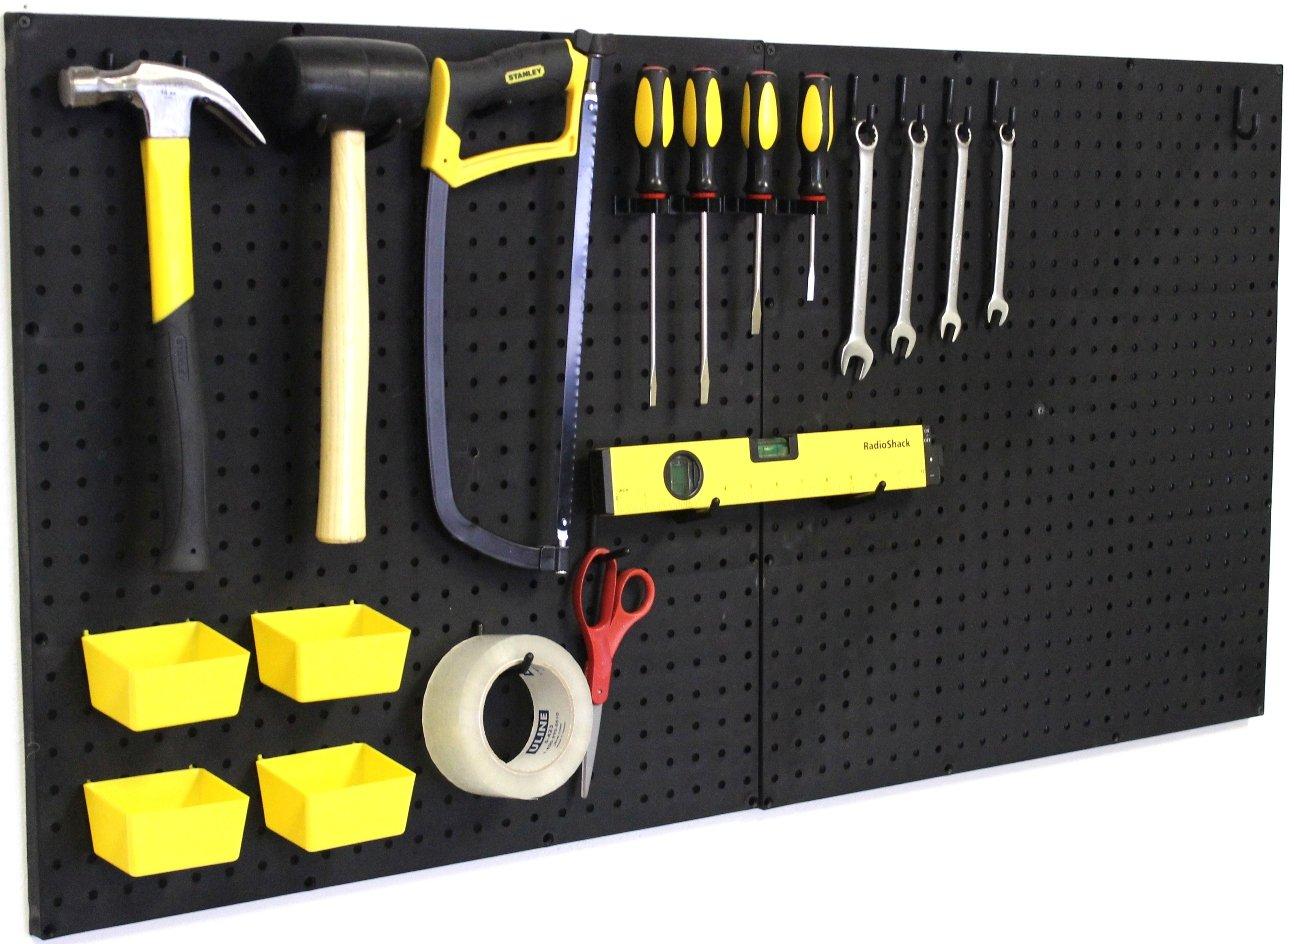 Pegboard Panels Wall Storage Kit in 48''- 72'' Widths Panel Set Garage Organizer (3) by WallPeg (Image #2)